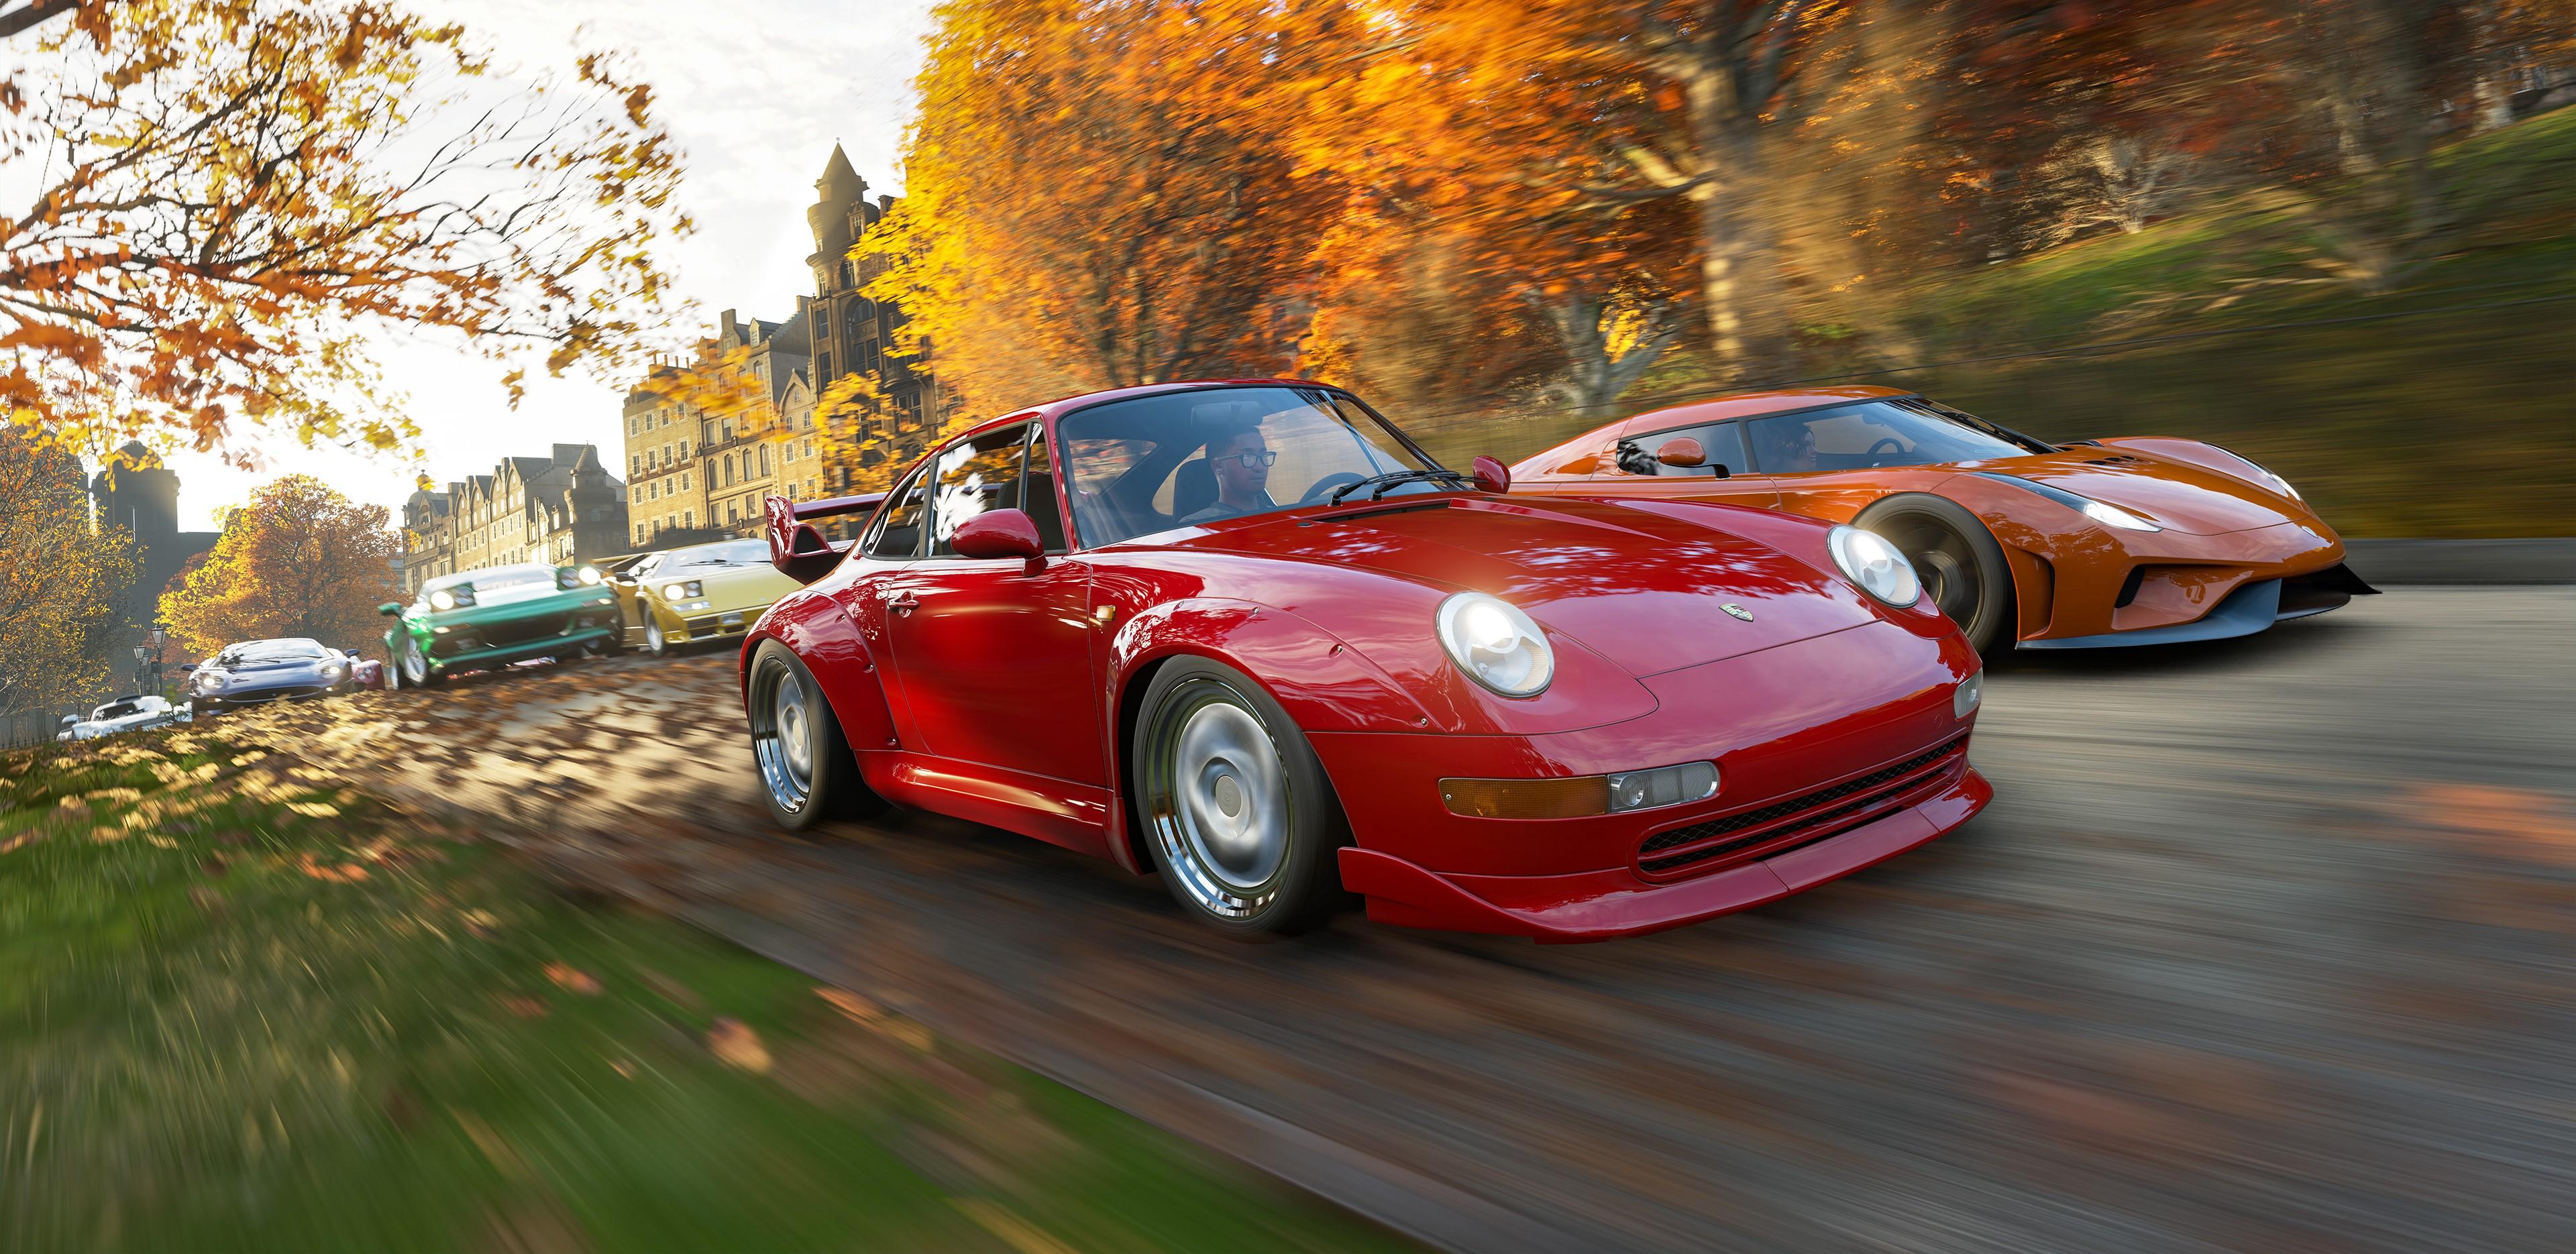 Обзор Forza Horizon 4 - Социалка на колёсах. - Изображение 8